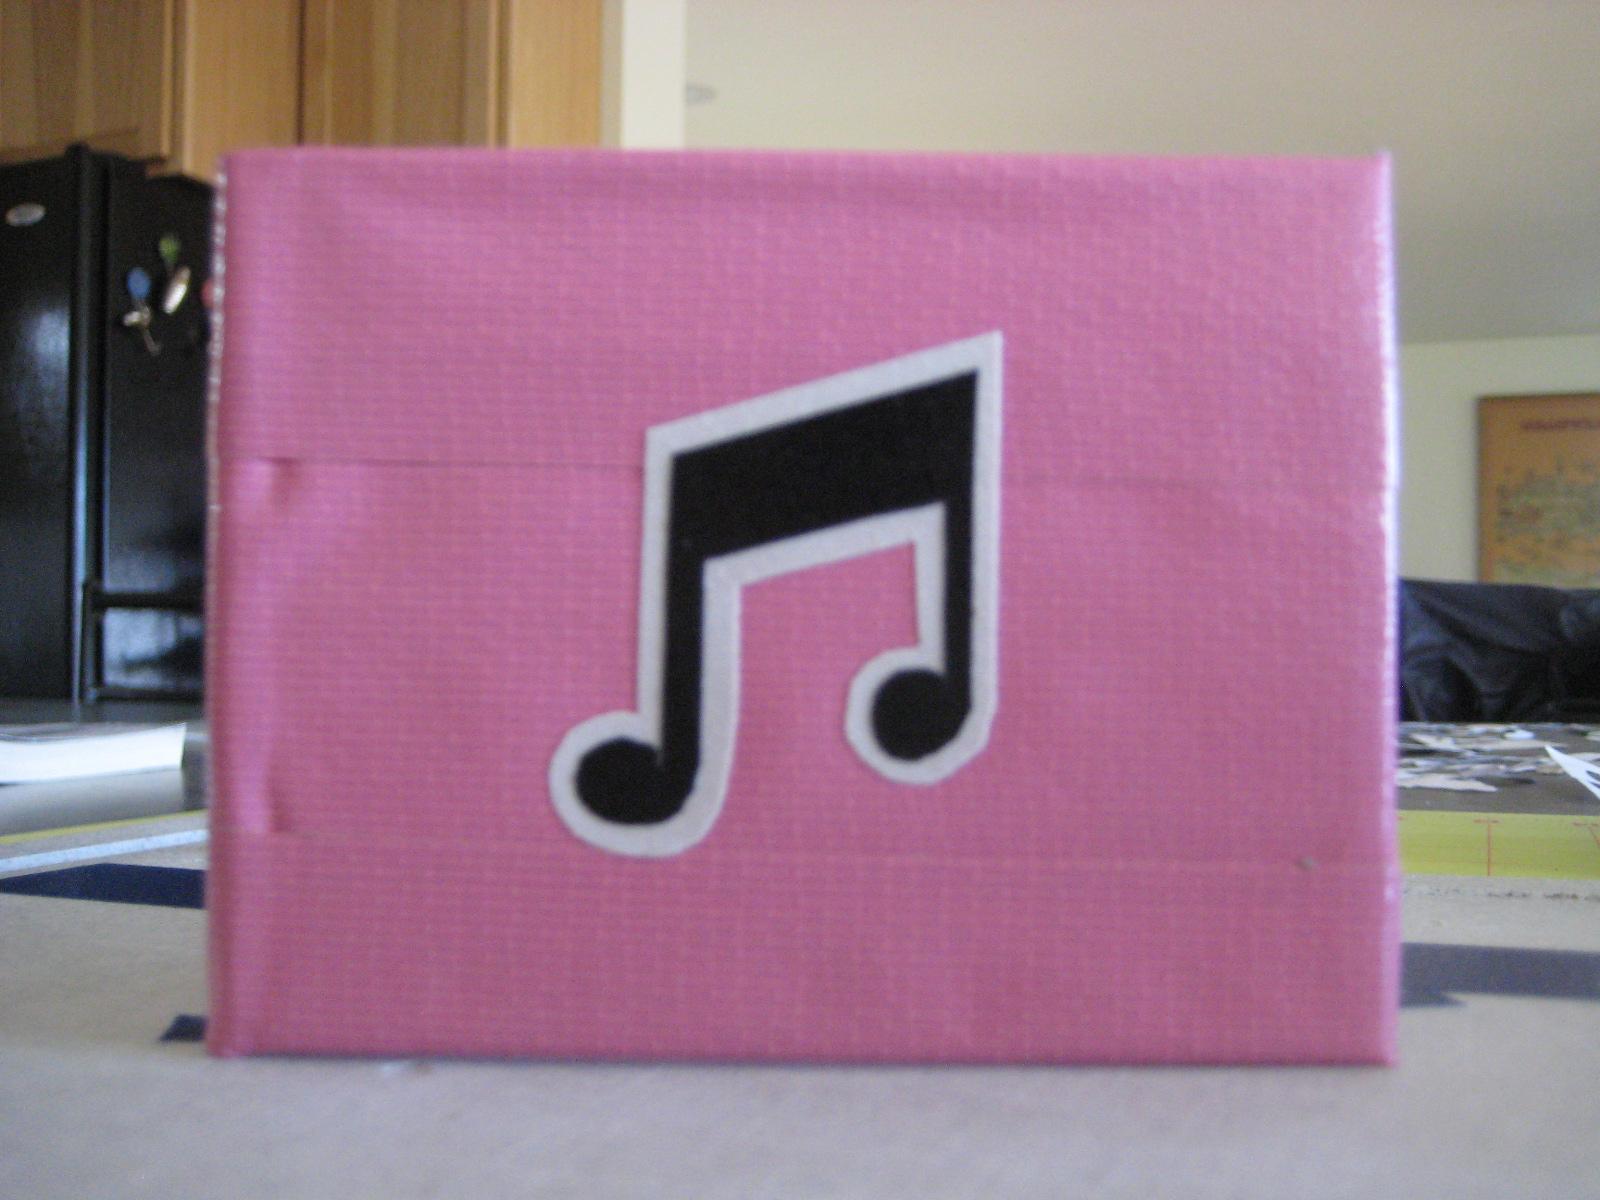 http://1.bp.blogspot.com/-X92vwaDwGiU/T38h4h4w7EI/AAAAAAAADoo/Tvuj_4VFj9k/s1600/music-notes-duct-tape-wallet.JPG